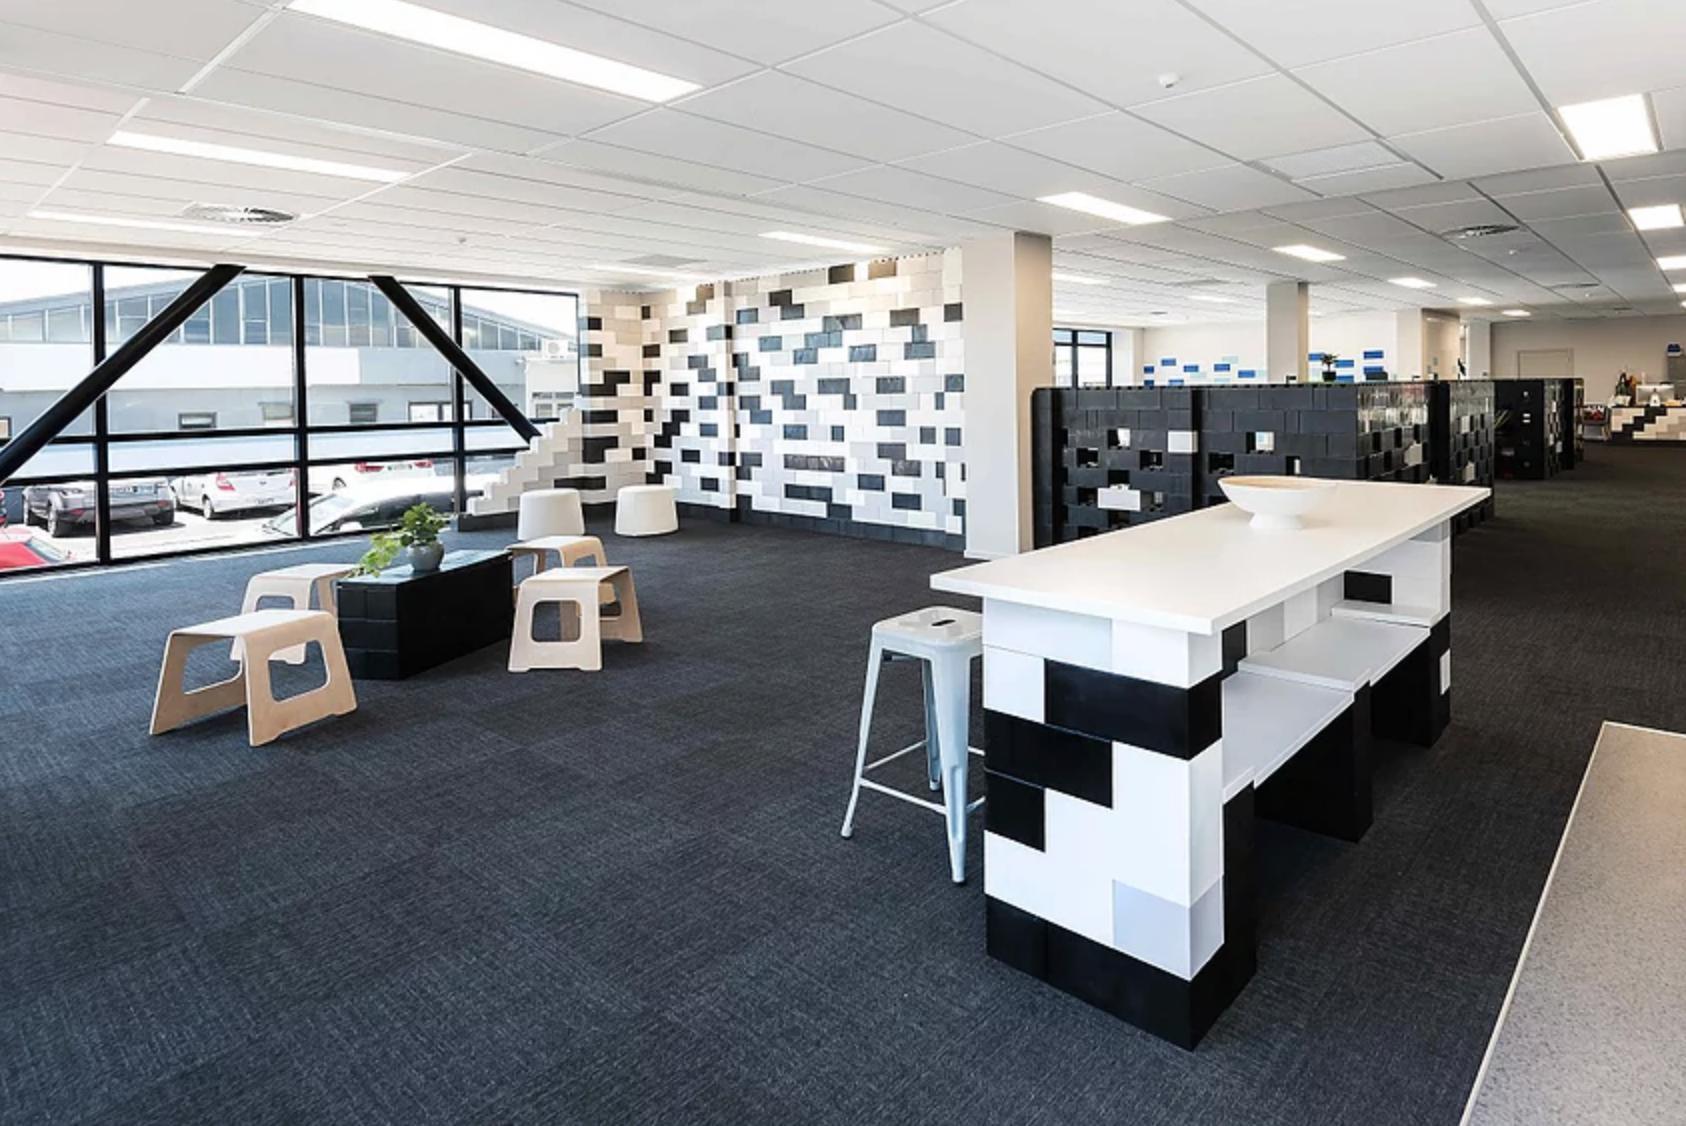 everblock modular office design, modular furniture